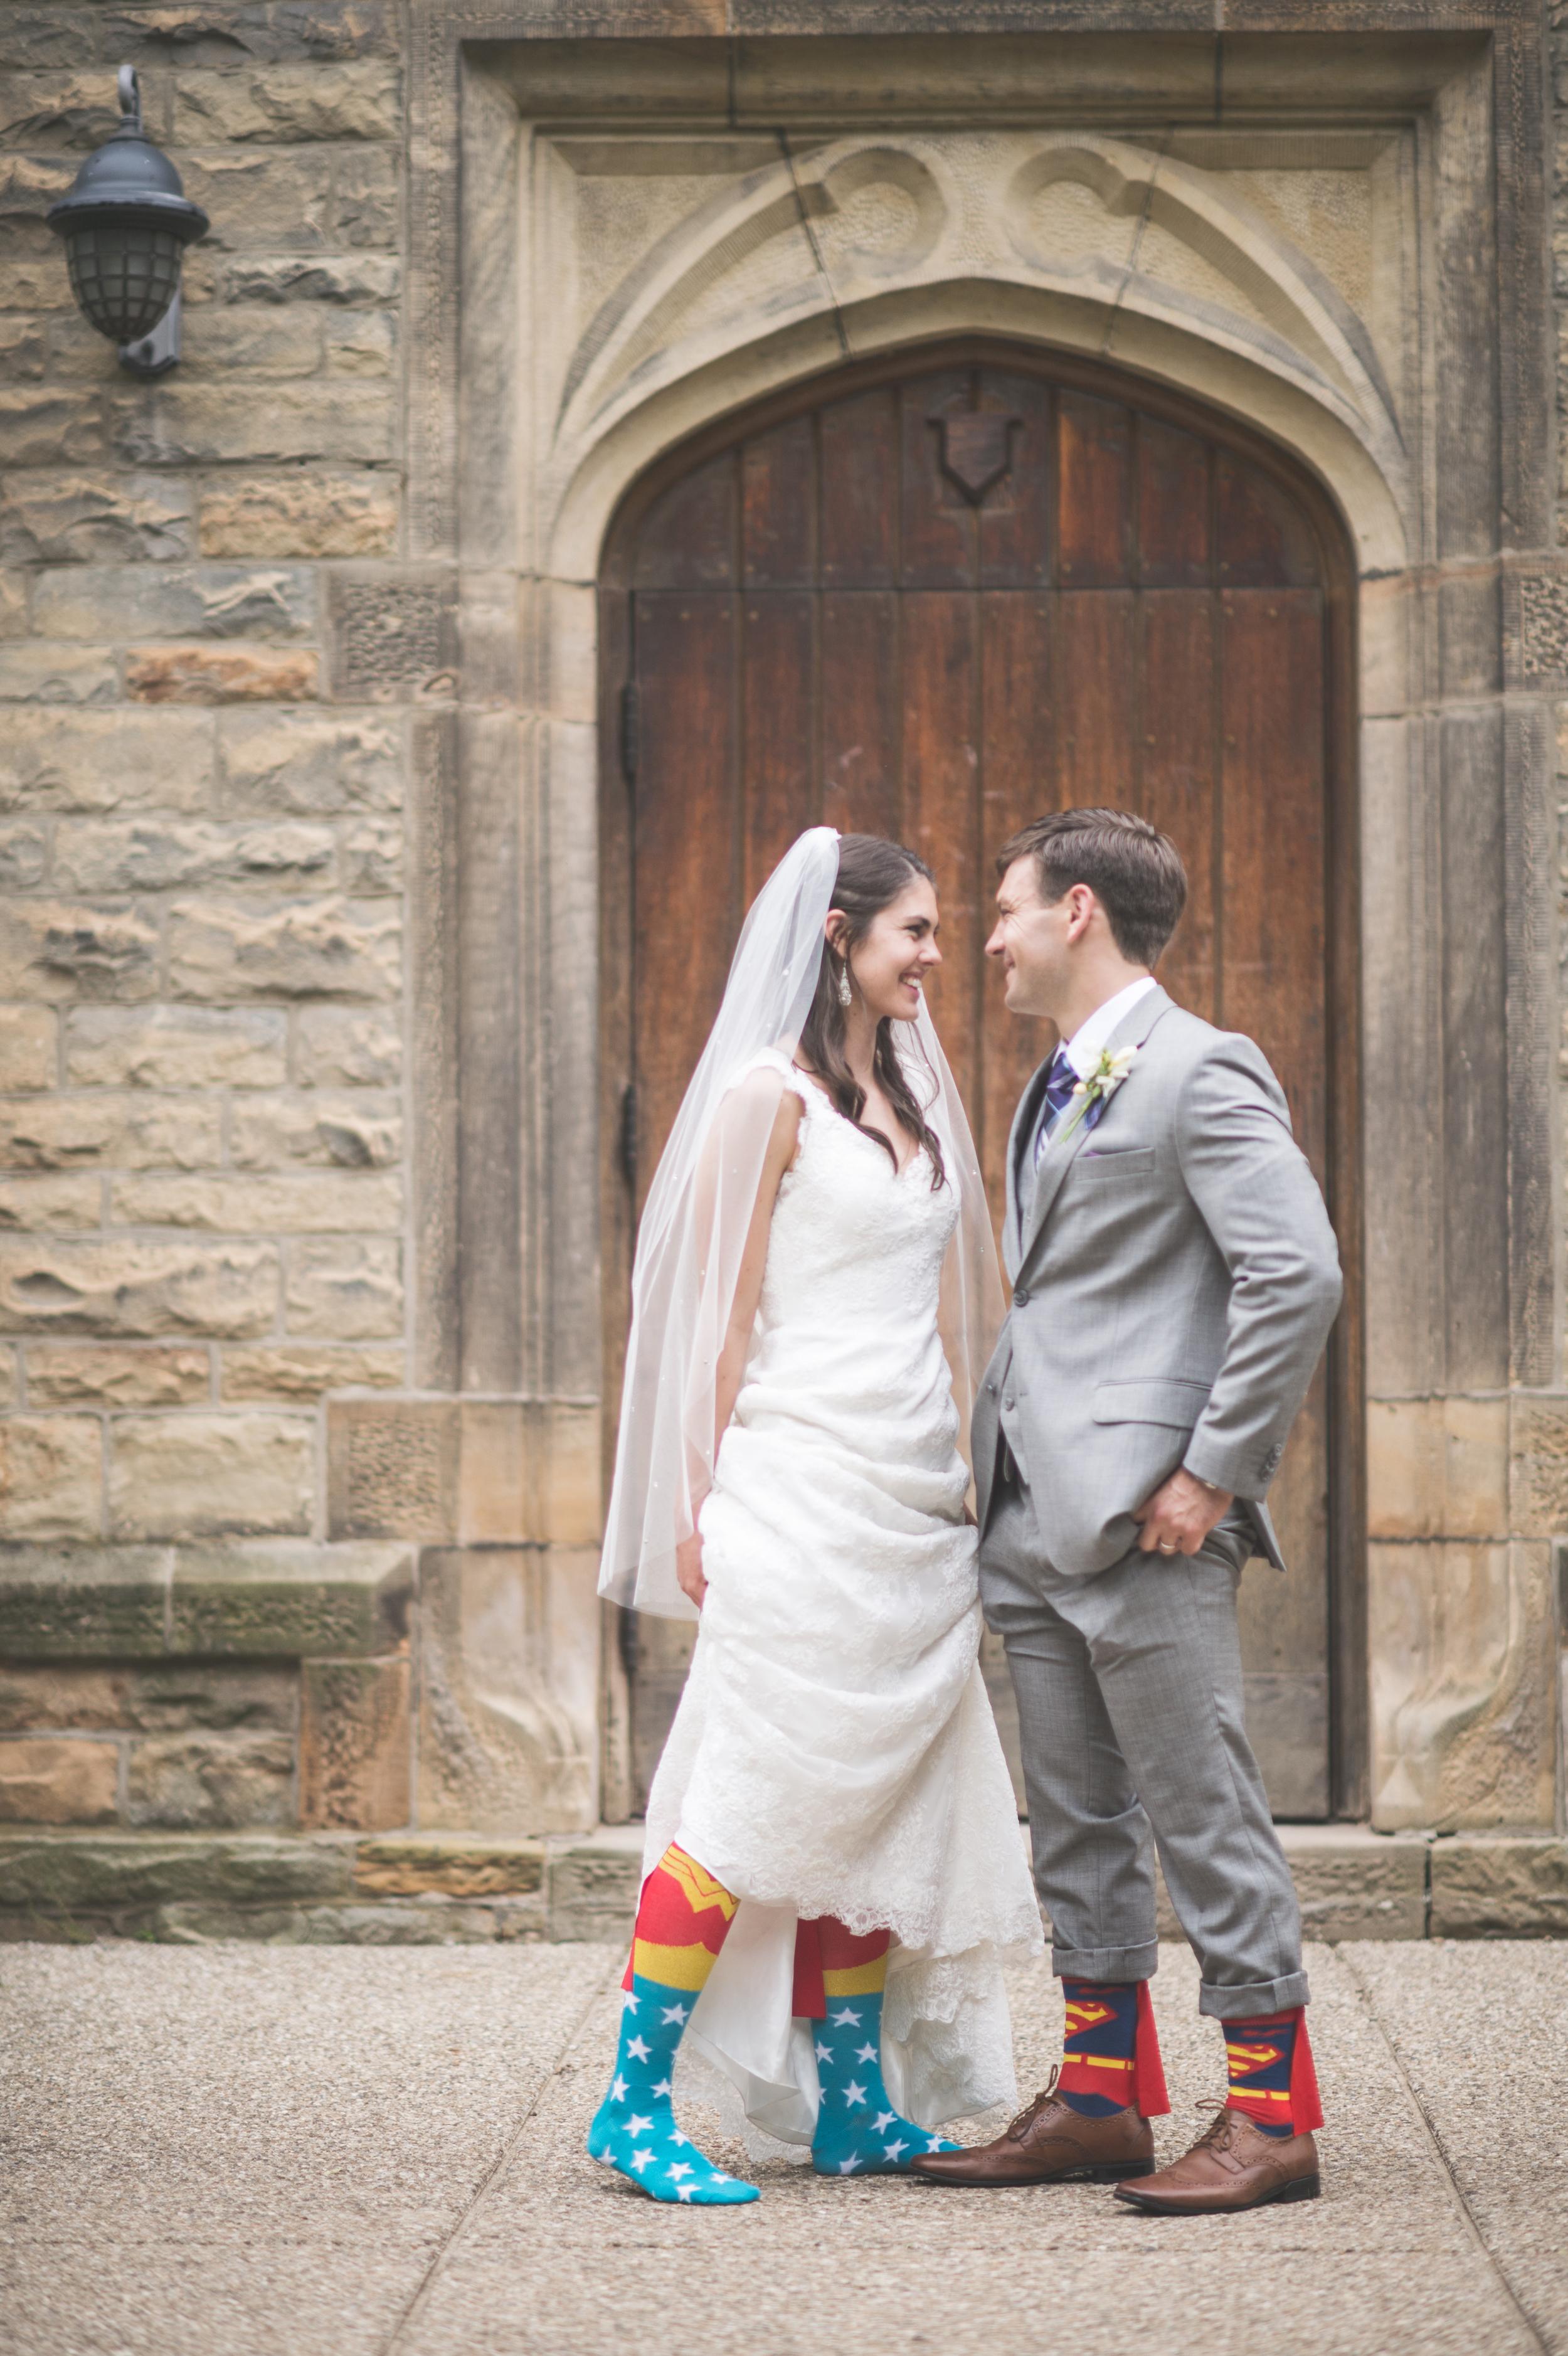 Bride and groom with superhero socks